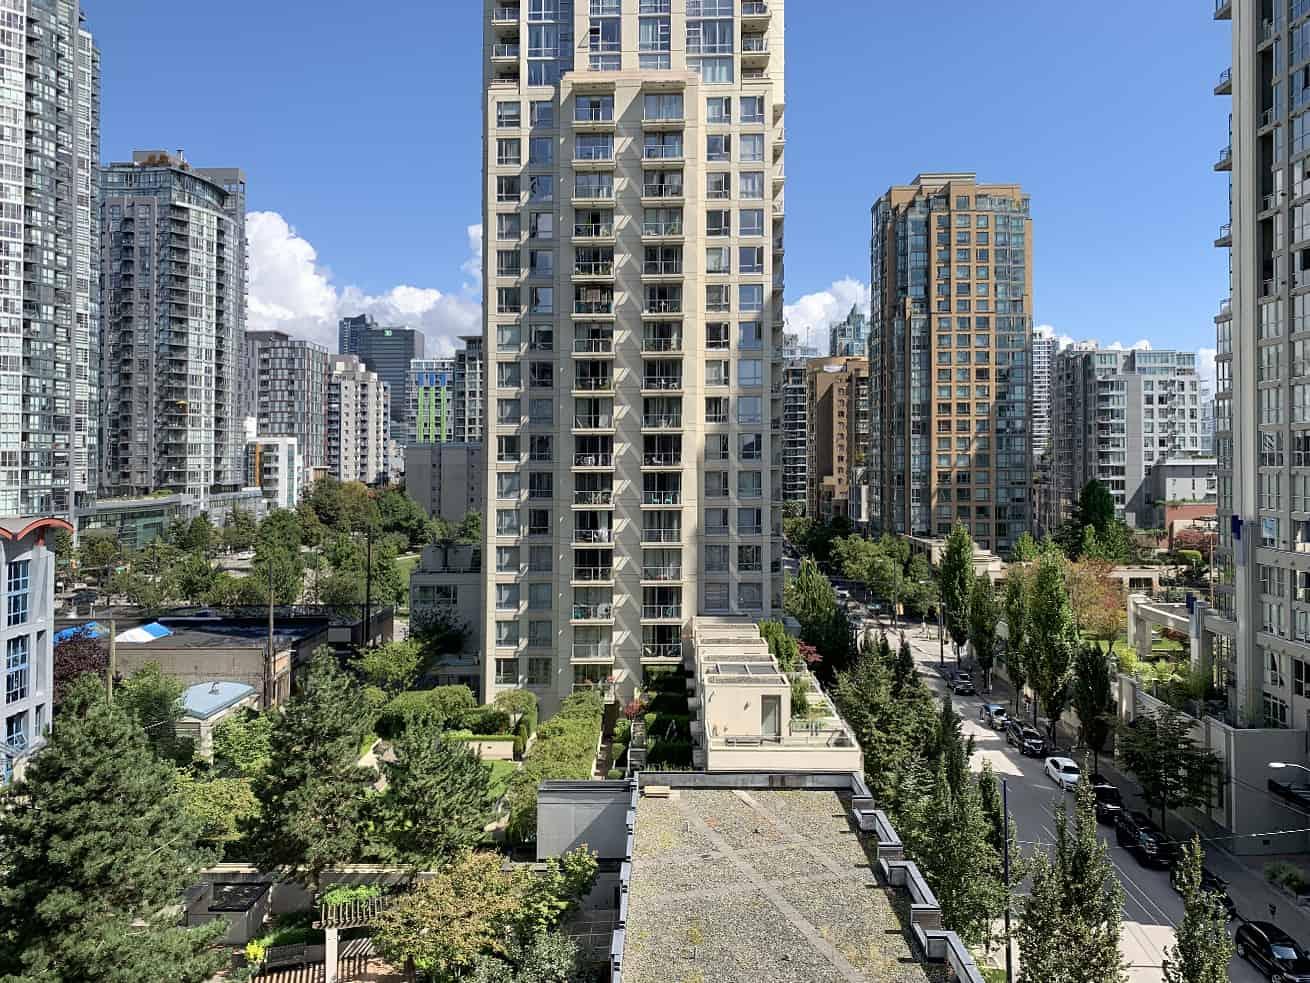 Vancouver apartments for rent oscar studio view